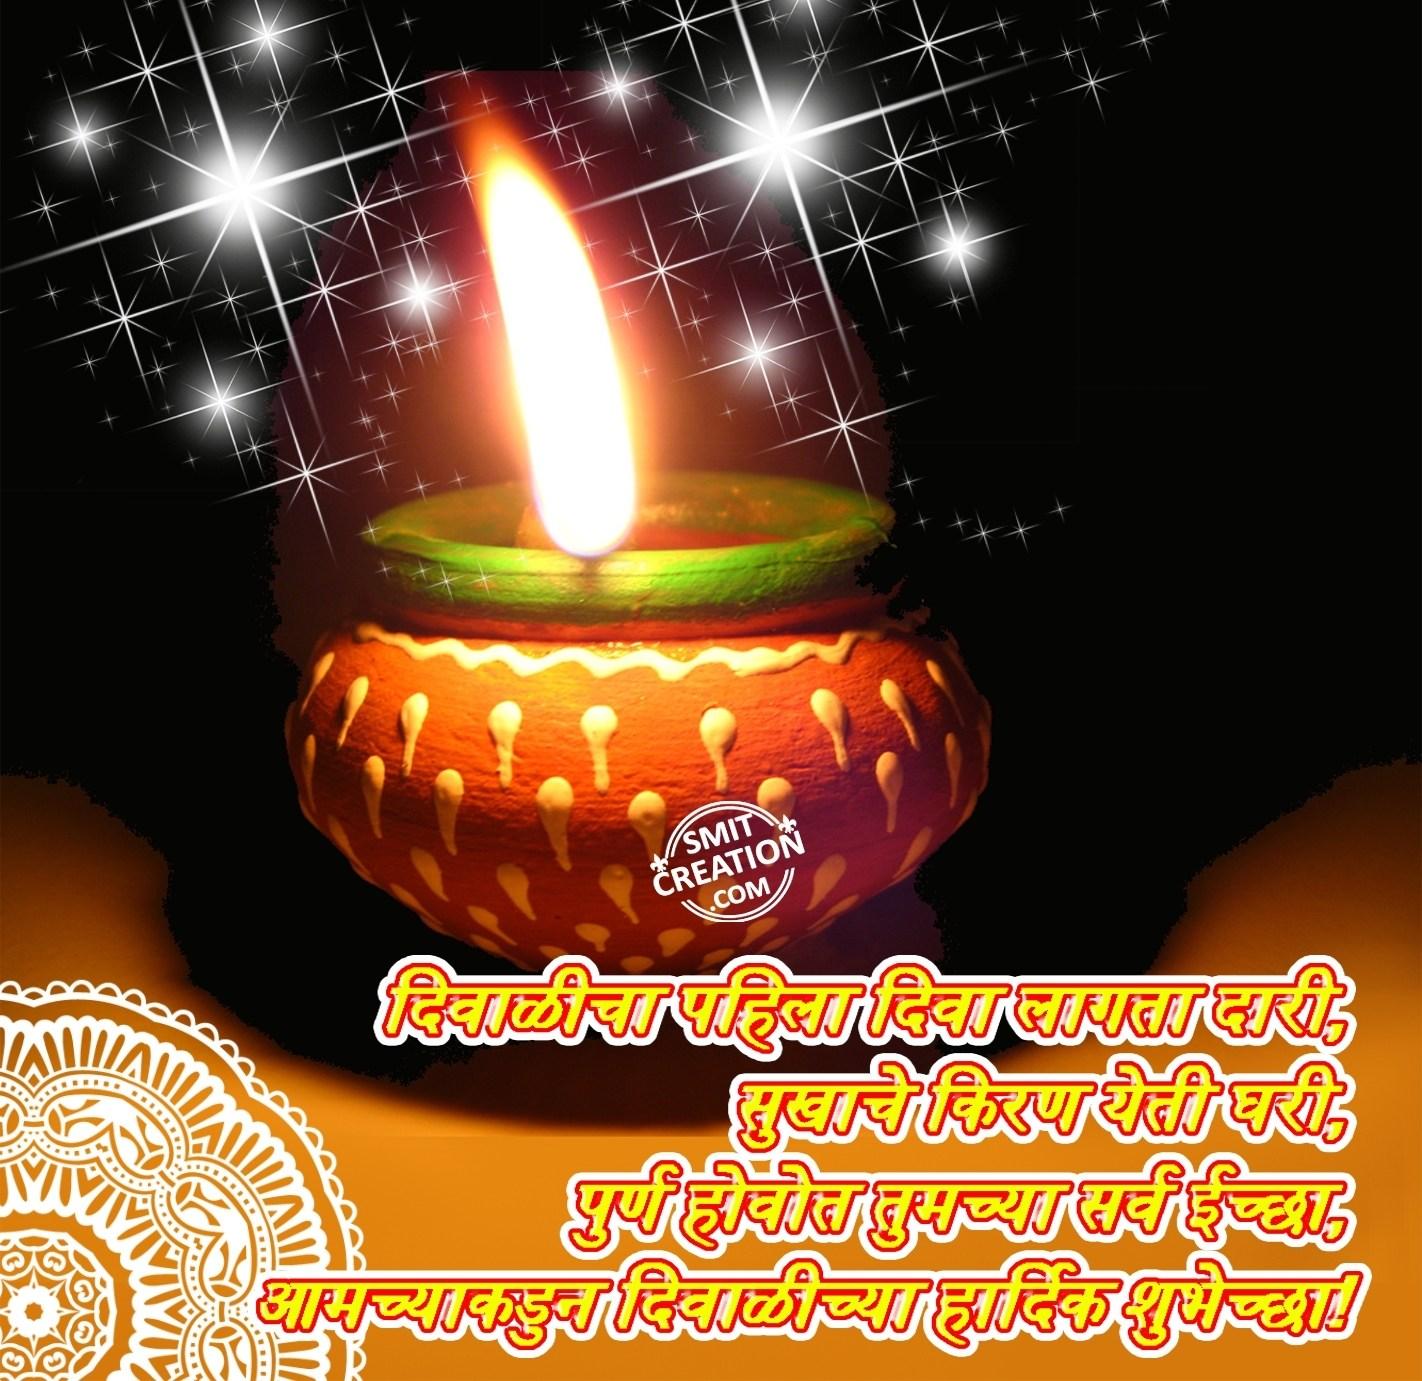 DIWALICHYA HARDIK SHUBHECHHA - SmitCreation.com Vadhdivas Chya Hardik Shubhechha